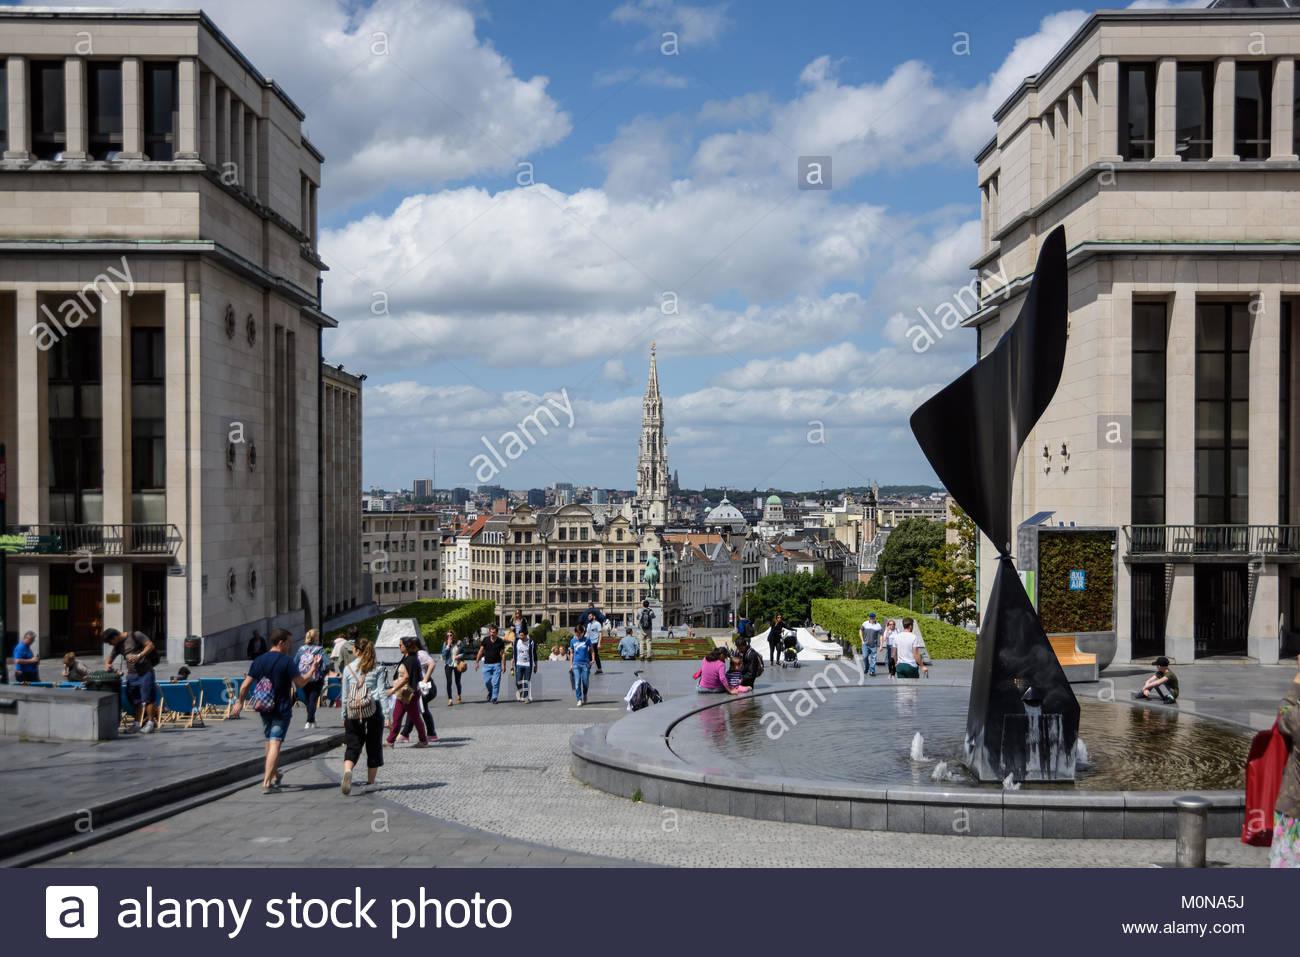 Brüssel, Mont des Arts, Whirling Ear, Brussels, Whirling Ear (Bruxelles, Brussel), Coudenberg, L oreille Tourbillonante - Stock Image